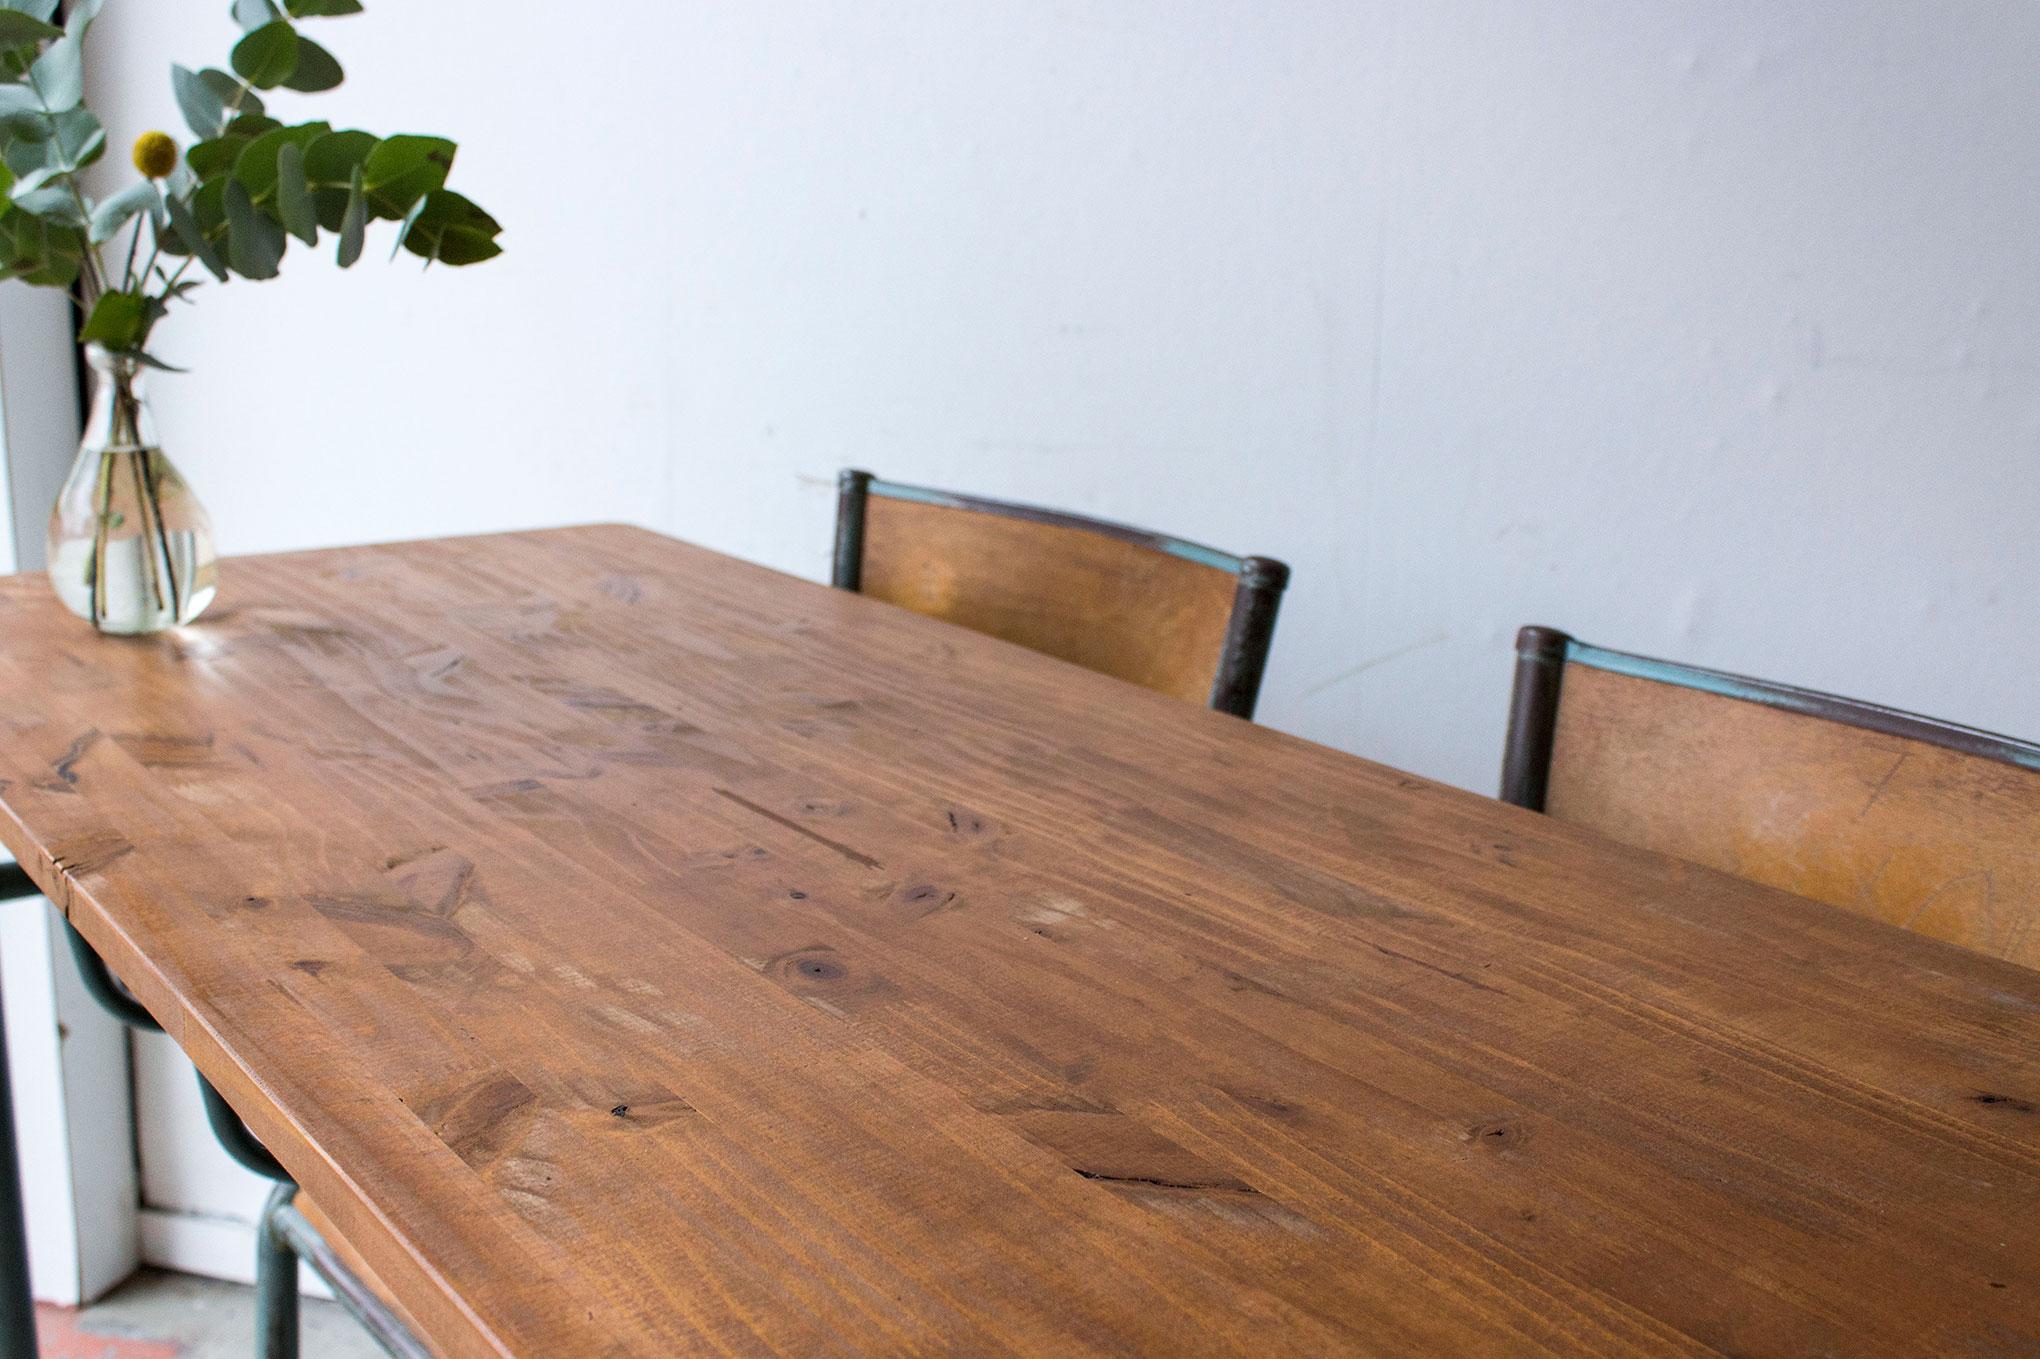 3170---vintage-schooltafel-grijsgroen-frame---Firma-zoethout_4.jpg